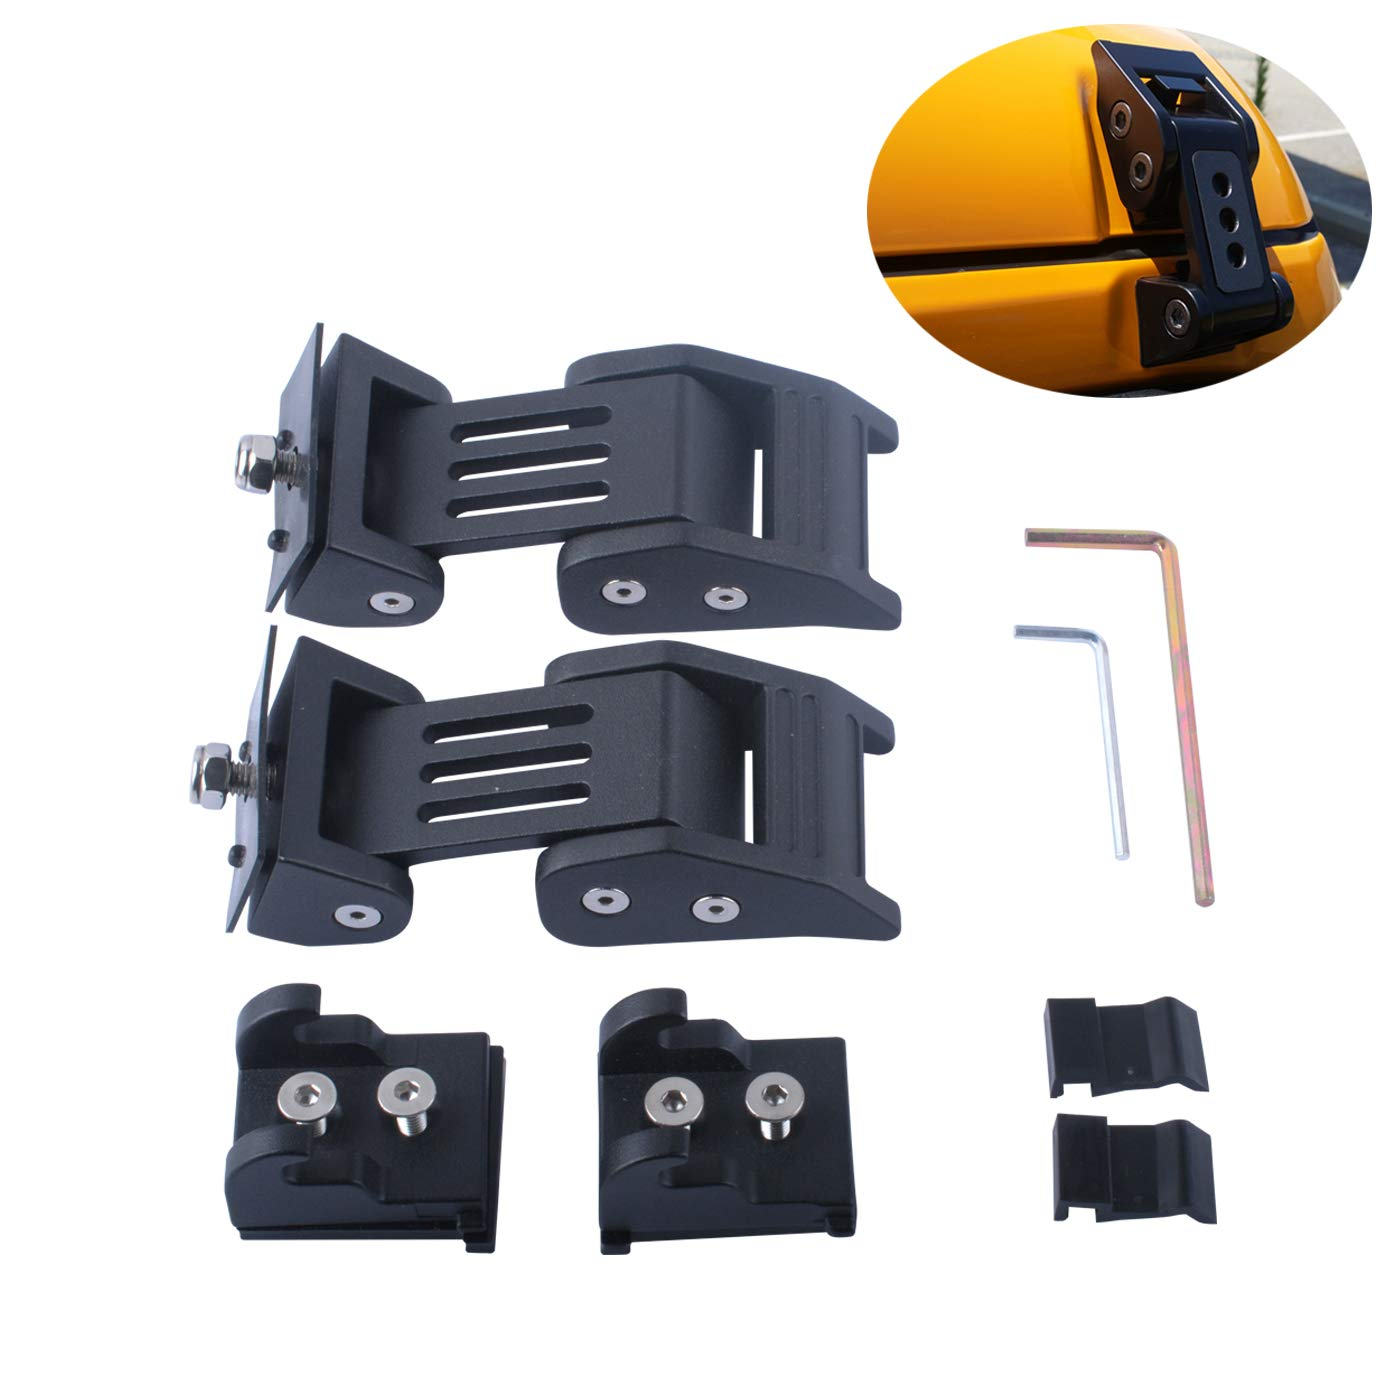 Hood Latches Lock Catch Kits for 2007-2016 Jeep Wrangler JK /& Unlimited JKU Heavy Duty Latch Locking Hood Catch Replacement